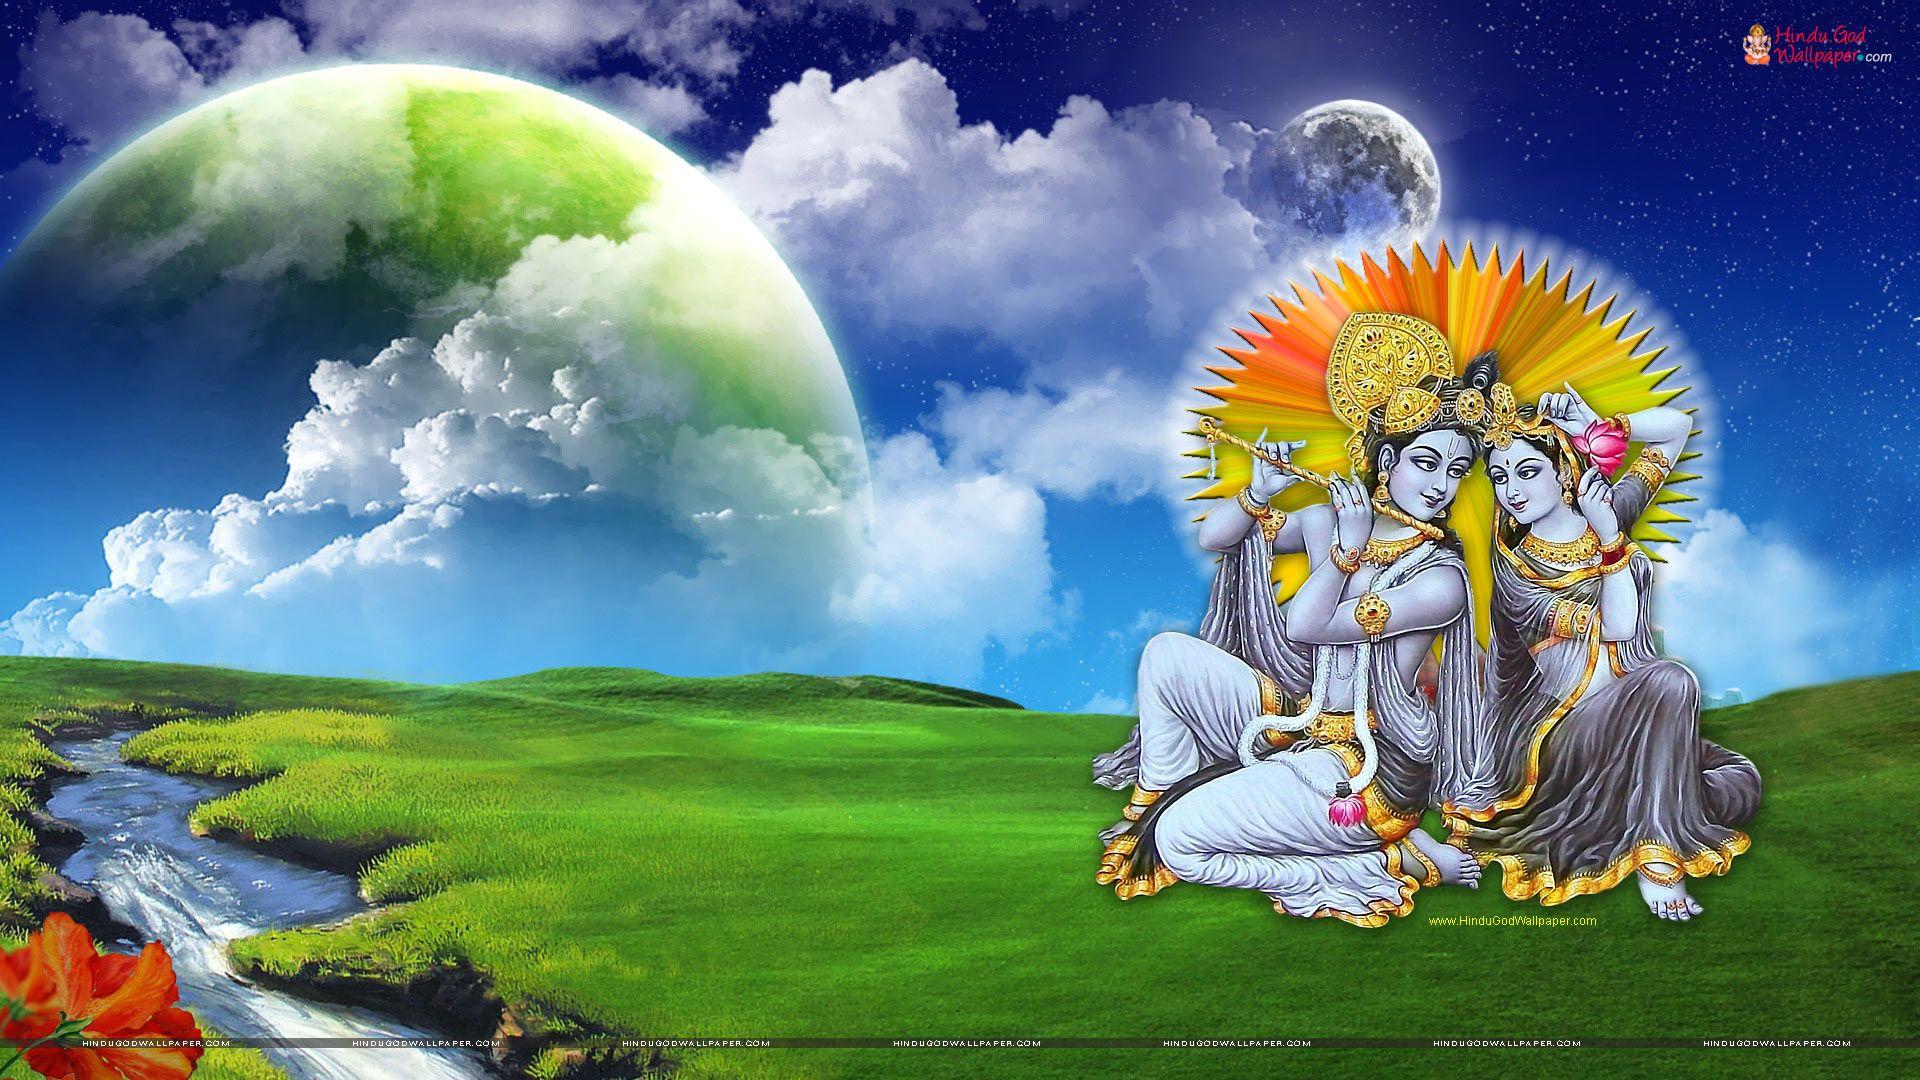 Radhe Krishna Hd Wallpaper Download Hd Nature Wallpapers Beautiful Nature Wallpaper Nature Desktop